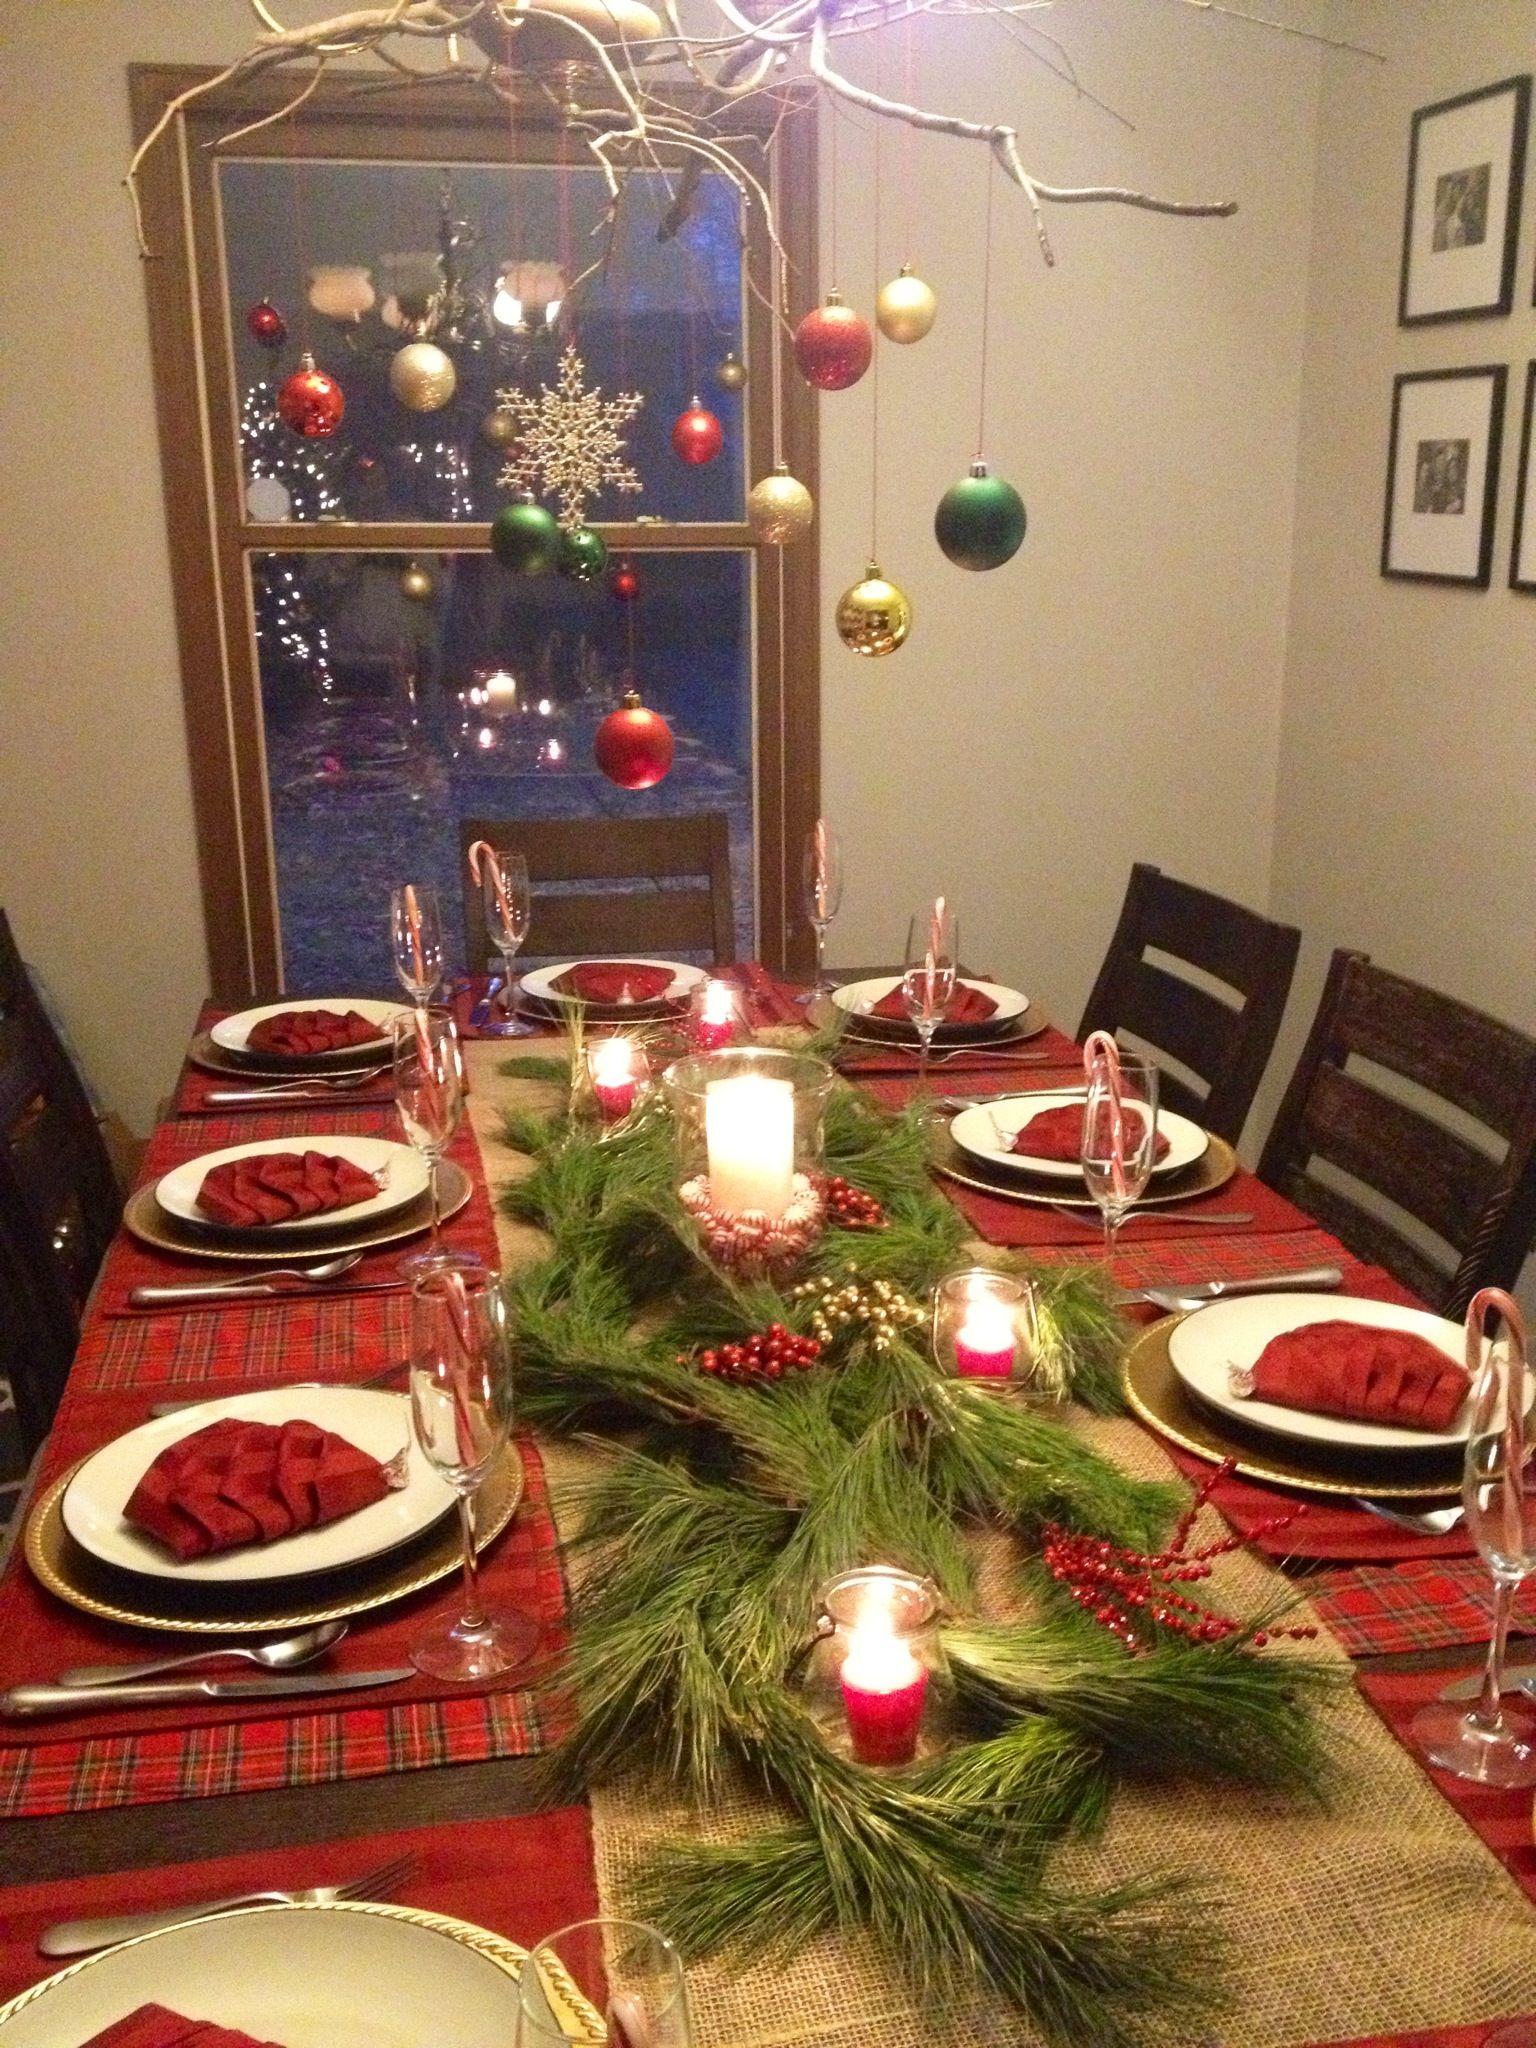 Christmas Dinner Table Decorations Christmas Decorations Dinner Table Christmas Dinner Table Settings Christmas Dinner Table